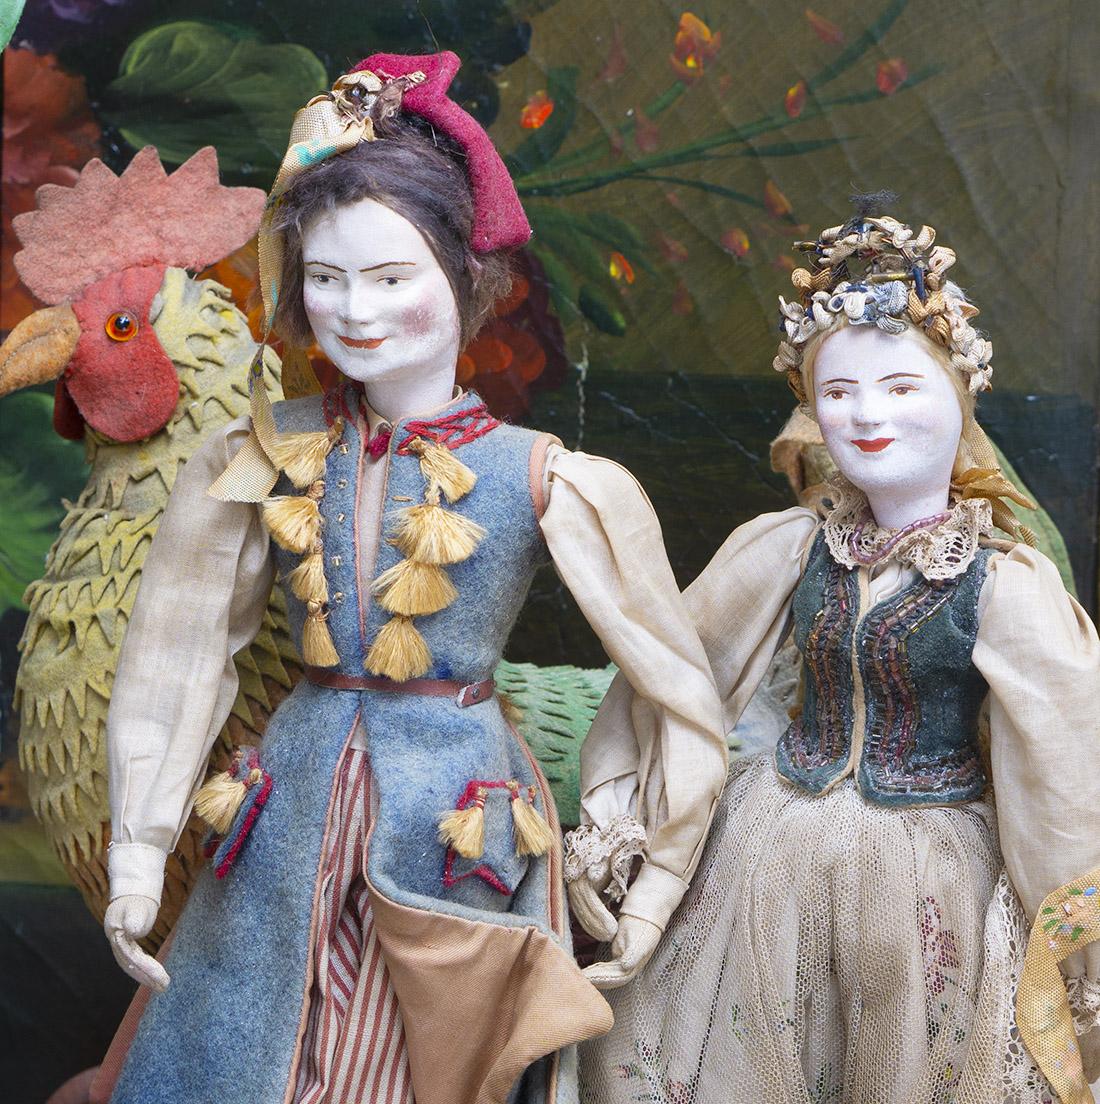 Two antique cloth dolls